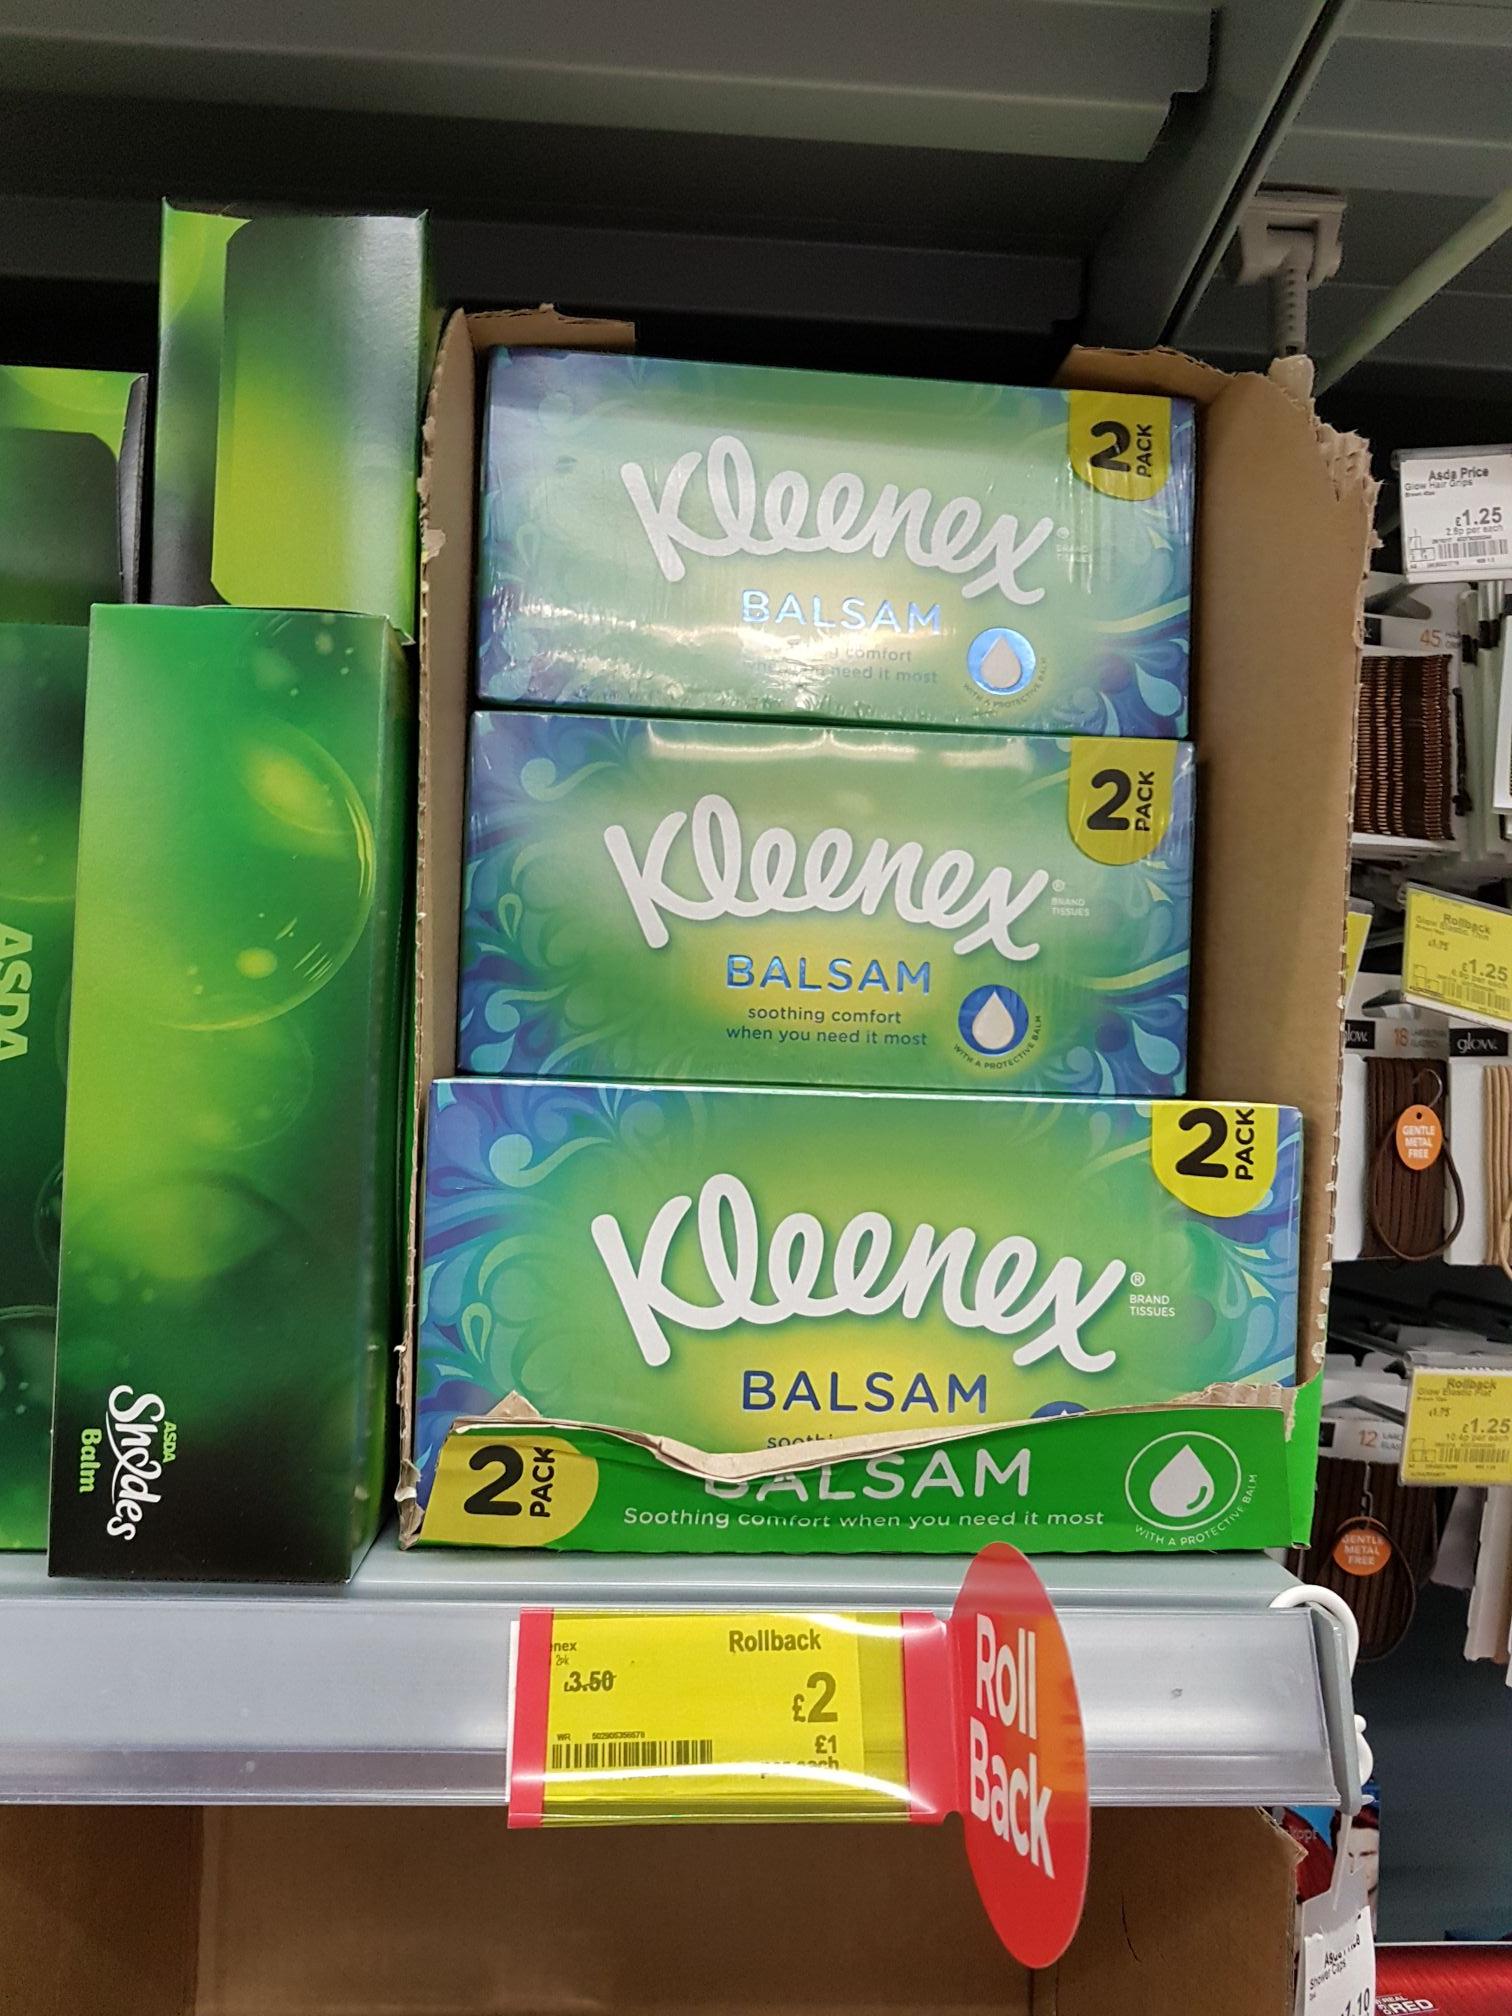 Kleenex Balsam 2 pack (72 Tissues in each box) £2 @ Asda